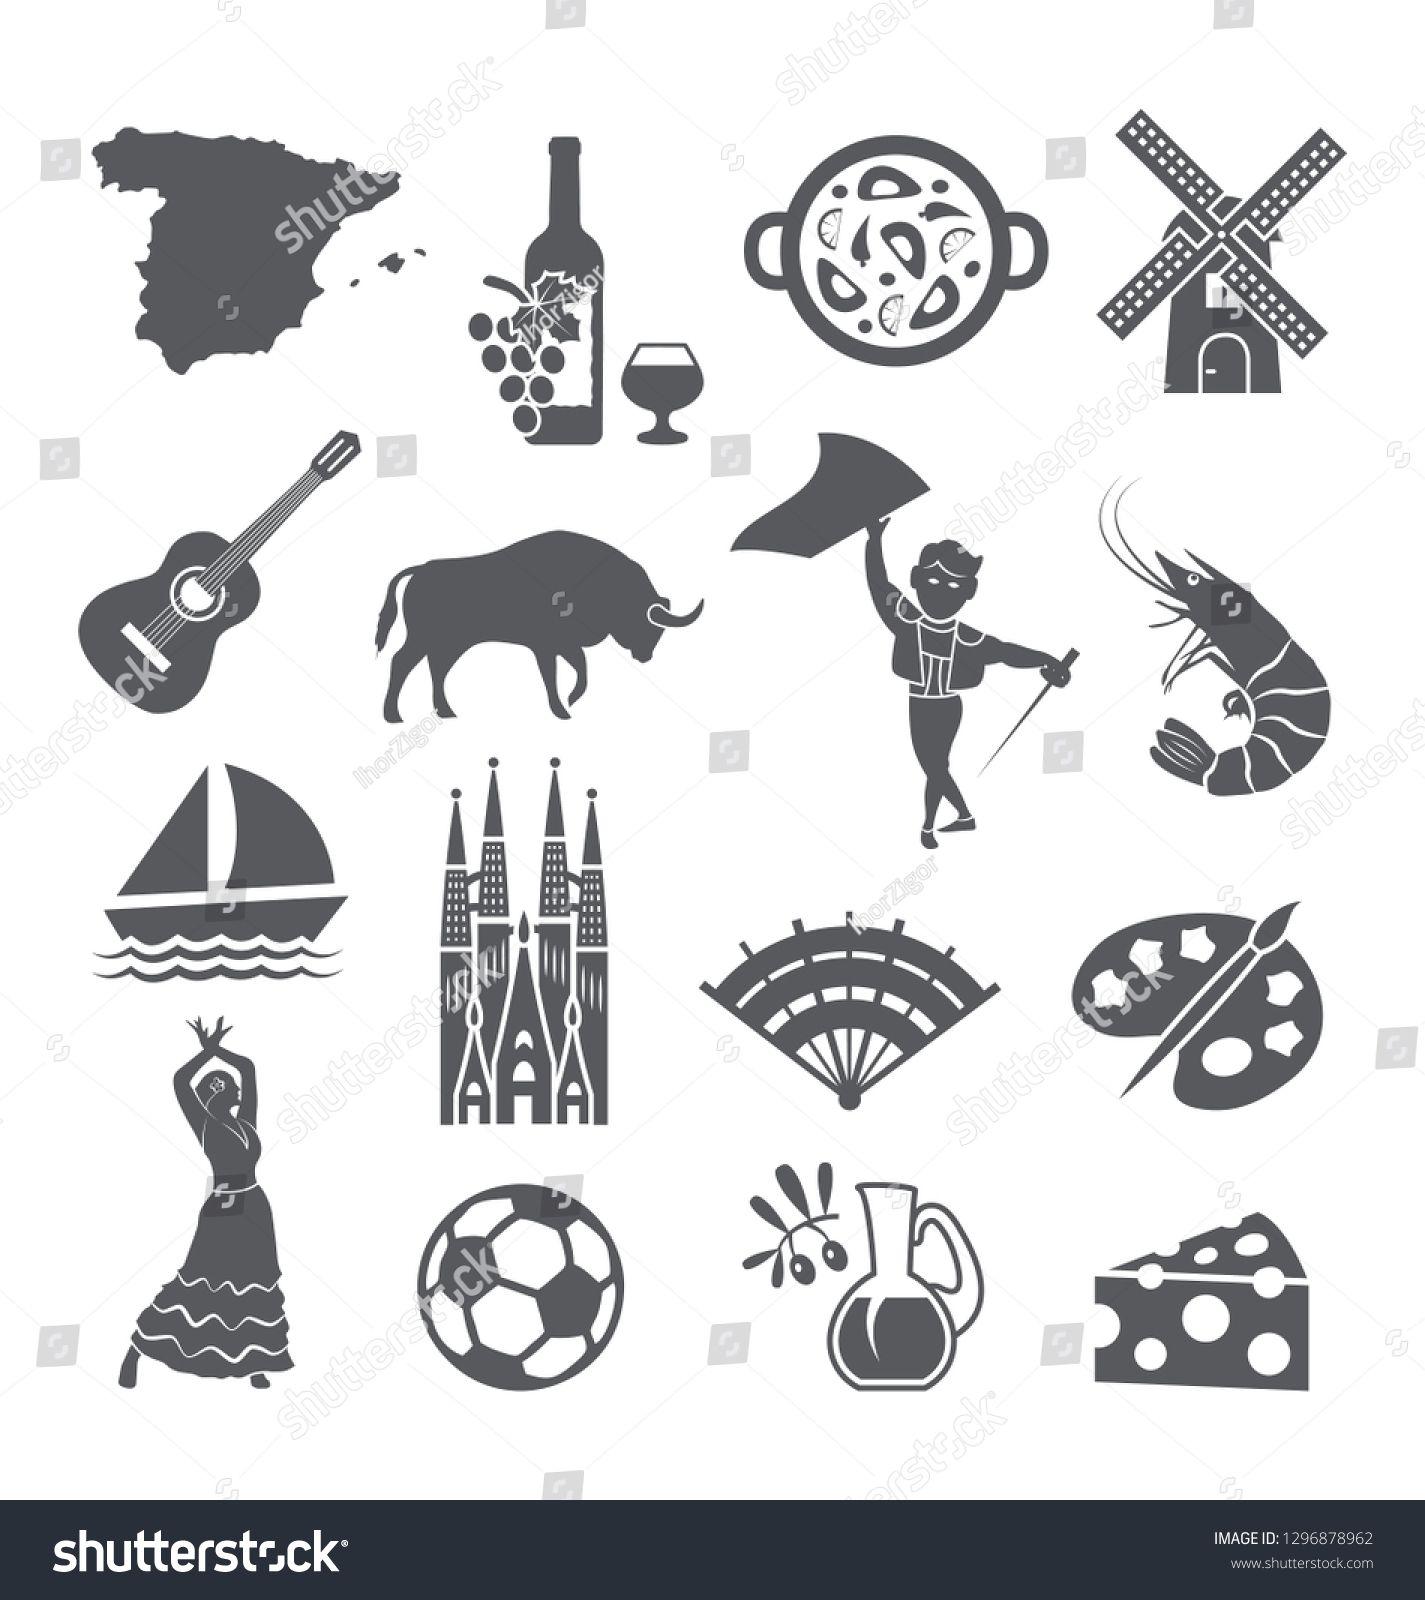 Spain Icons Set Spanish Traditional Symbols And Objects On White Sponsored Sponsored Set Spanis Icon Set Social Media Design Graphics City Illustration